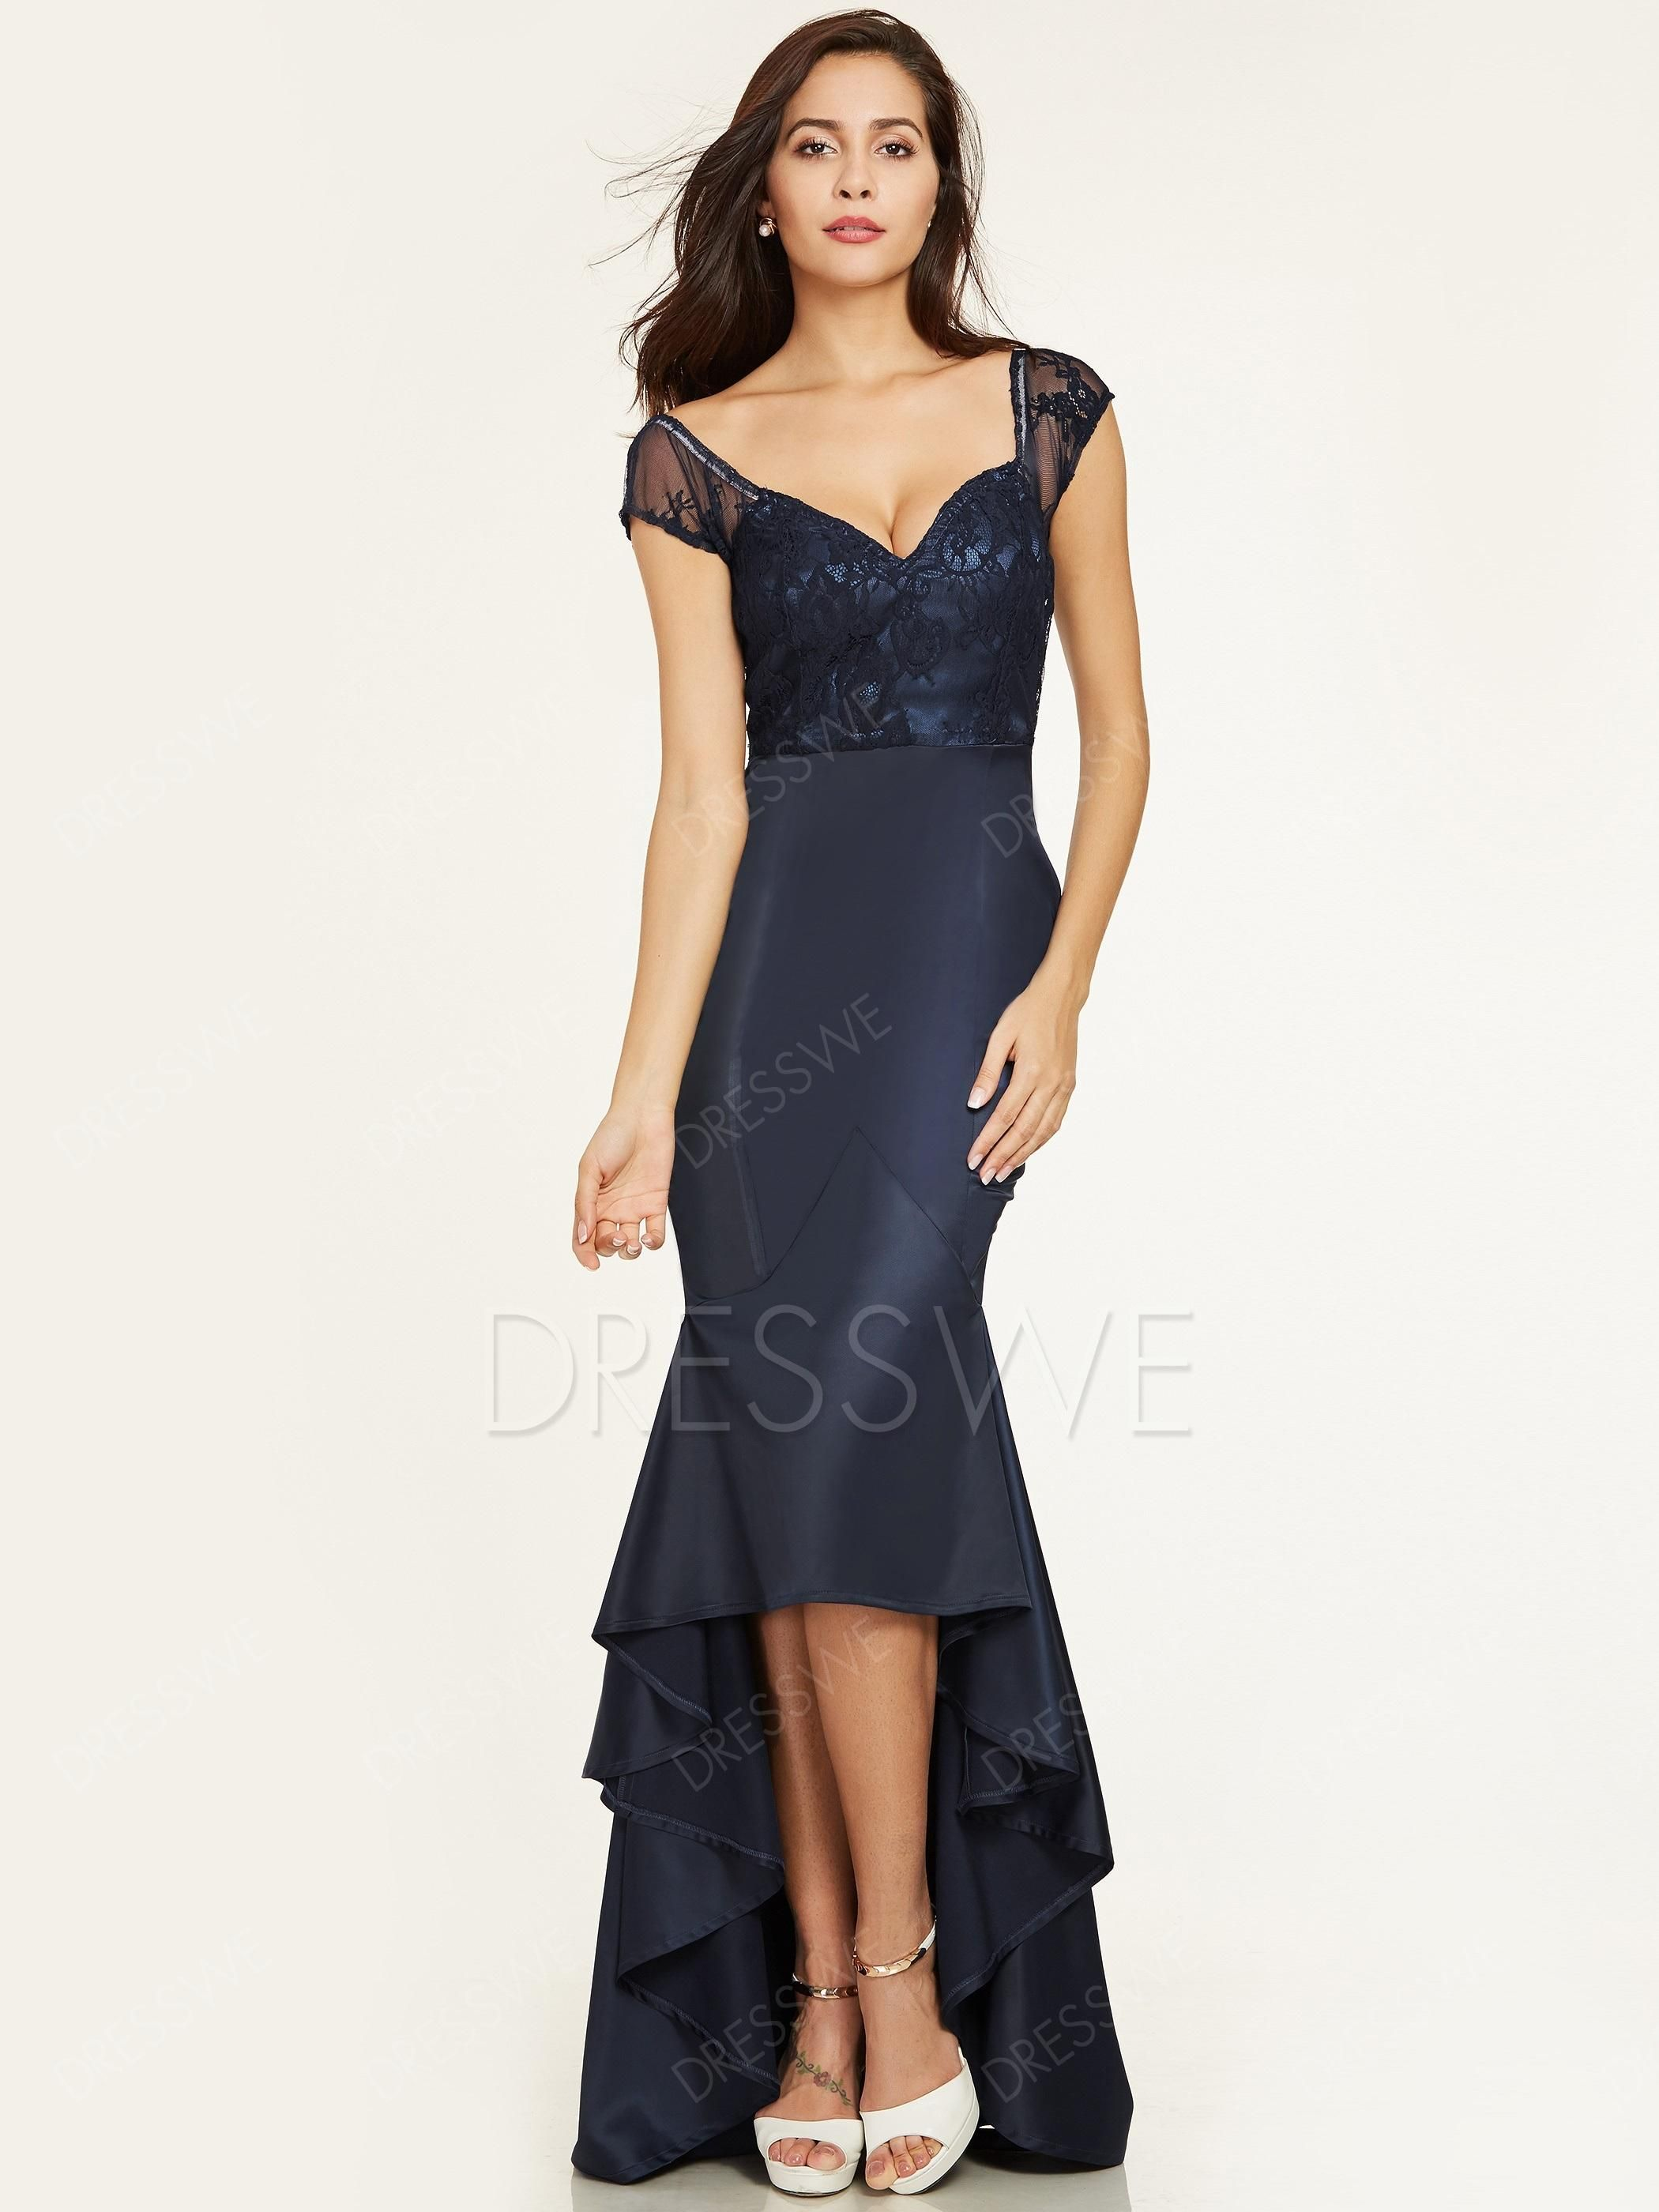 Dresswe dresswe v neck cap sleeves mermaid evening dress